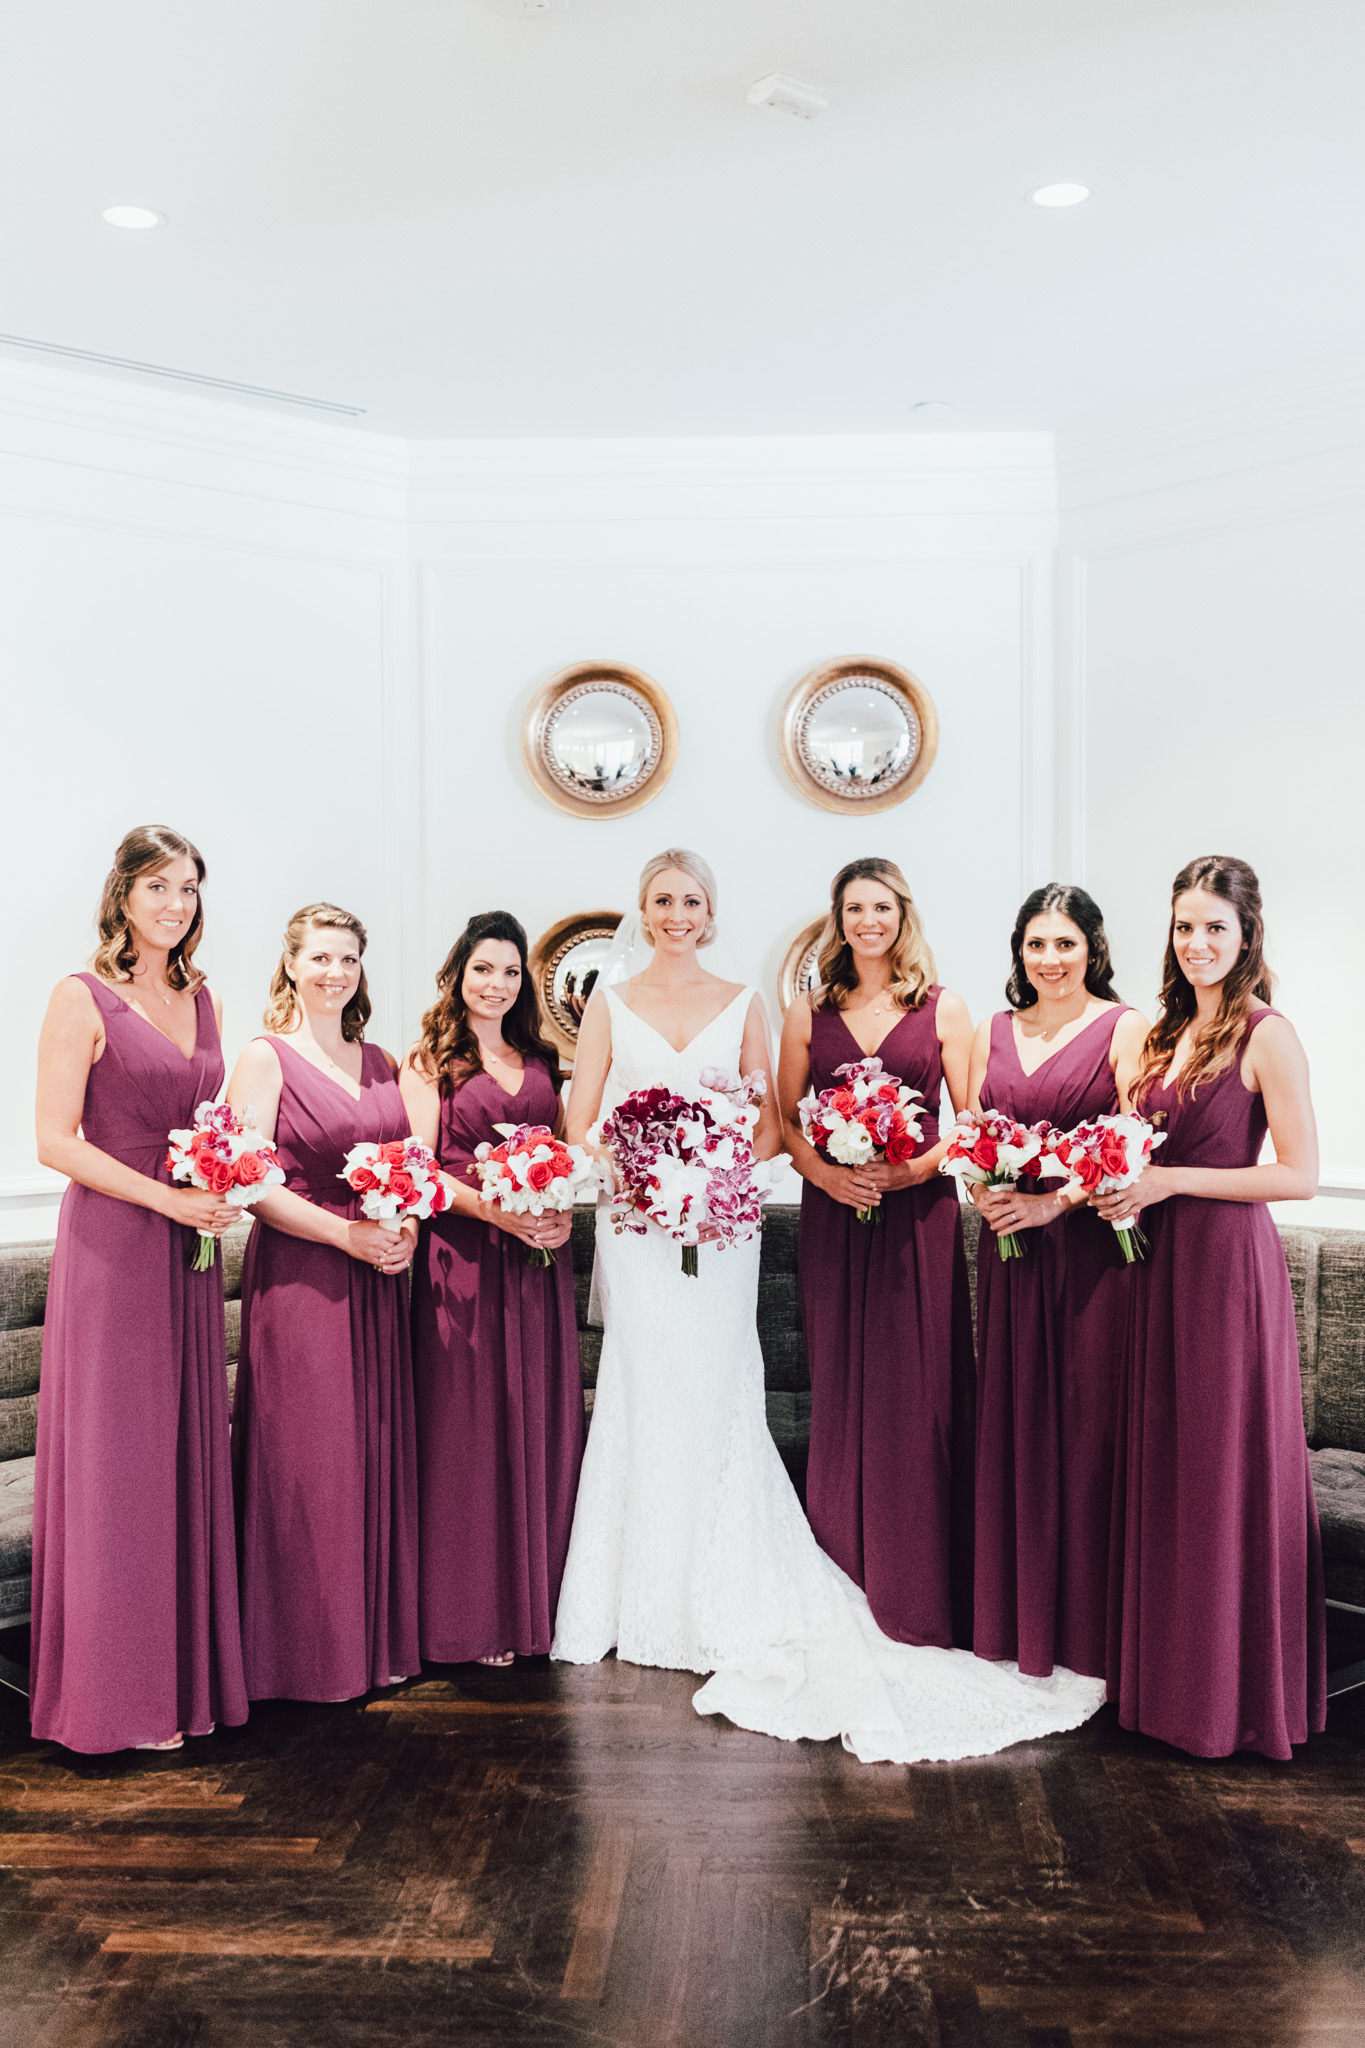 Brooke-Kyle-Indianapolis-Wedding-Blog-63.jpg